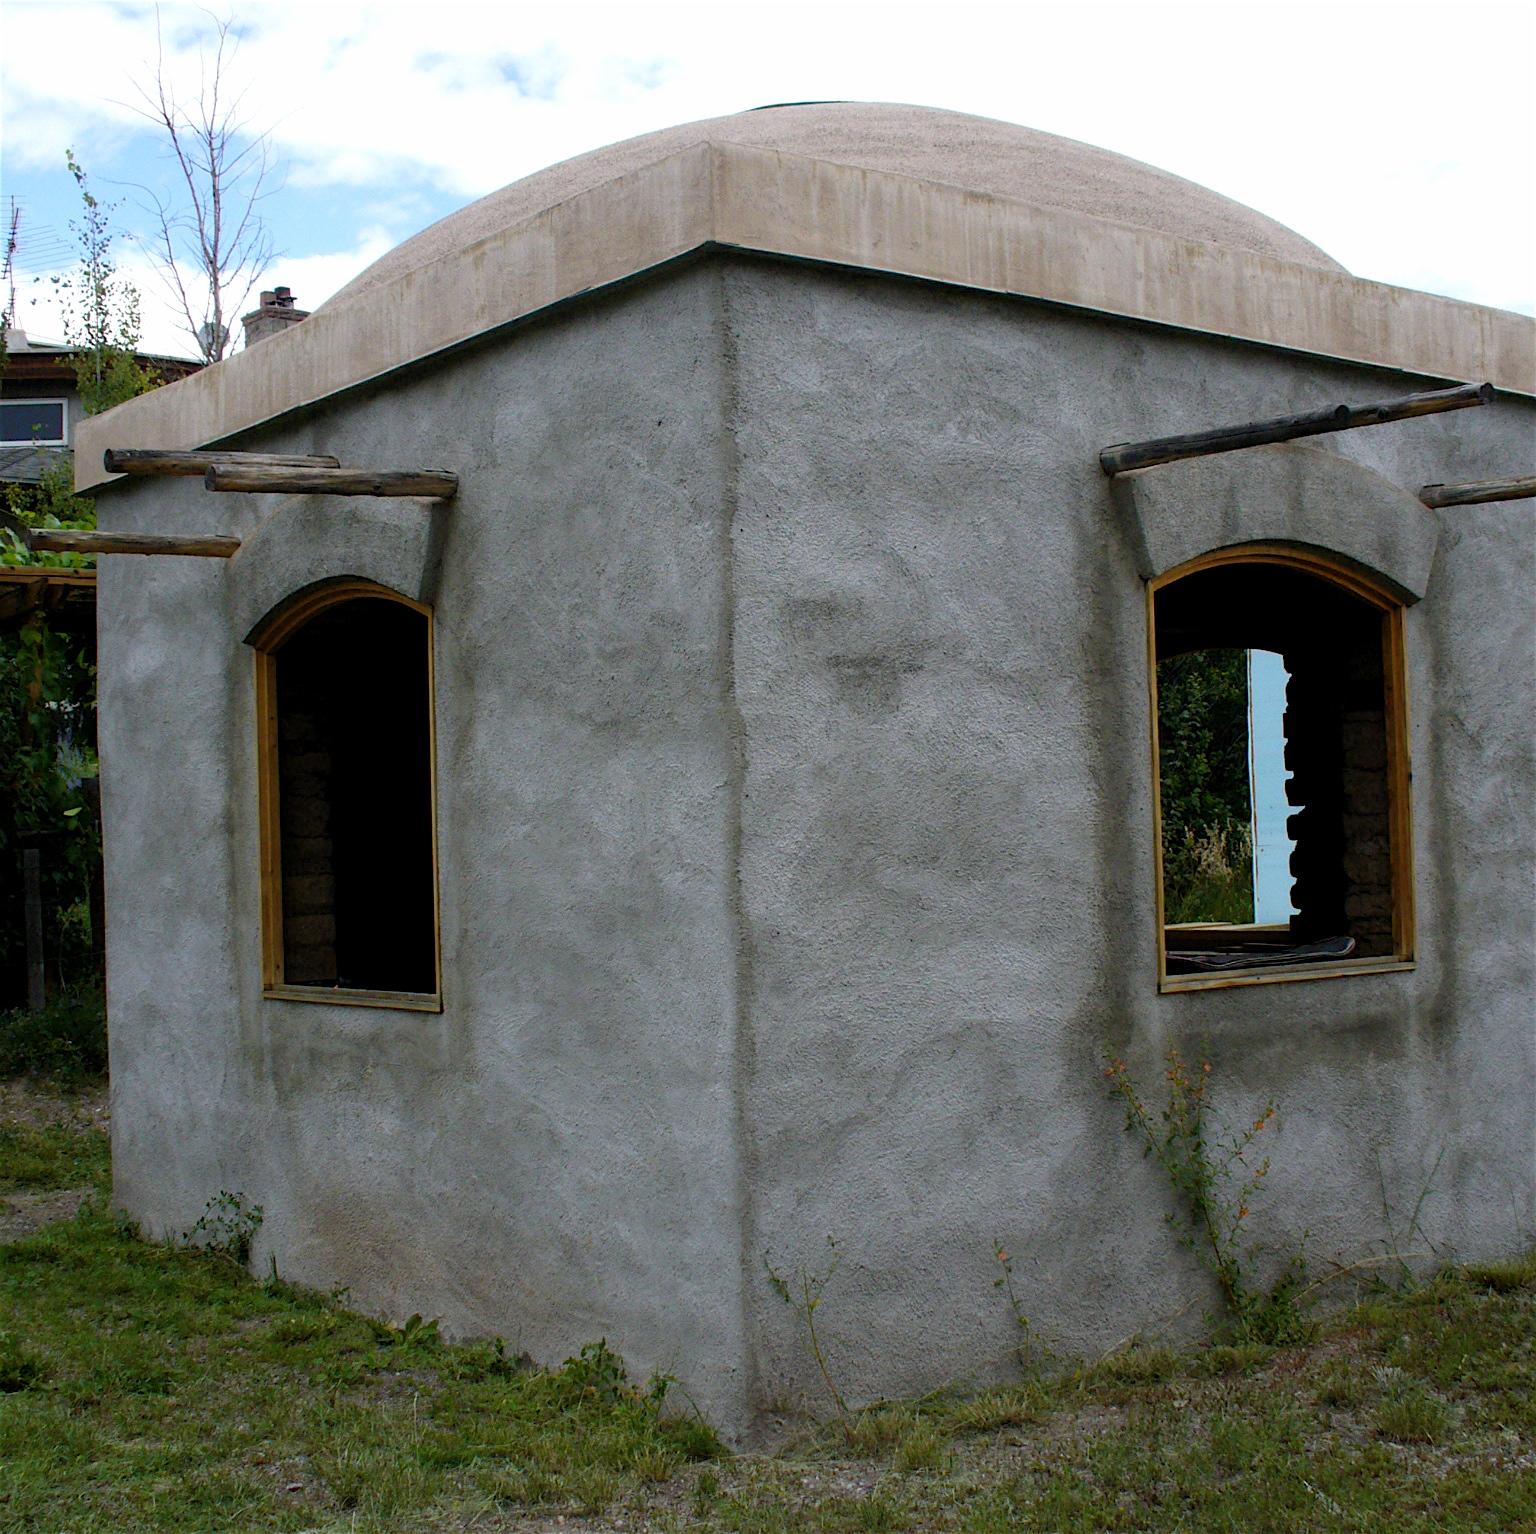 Alt Build Blog An Adobe Dome Building